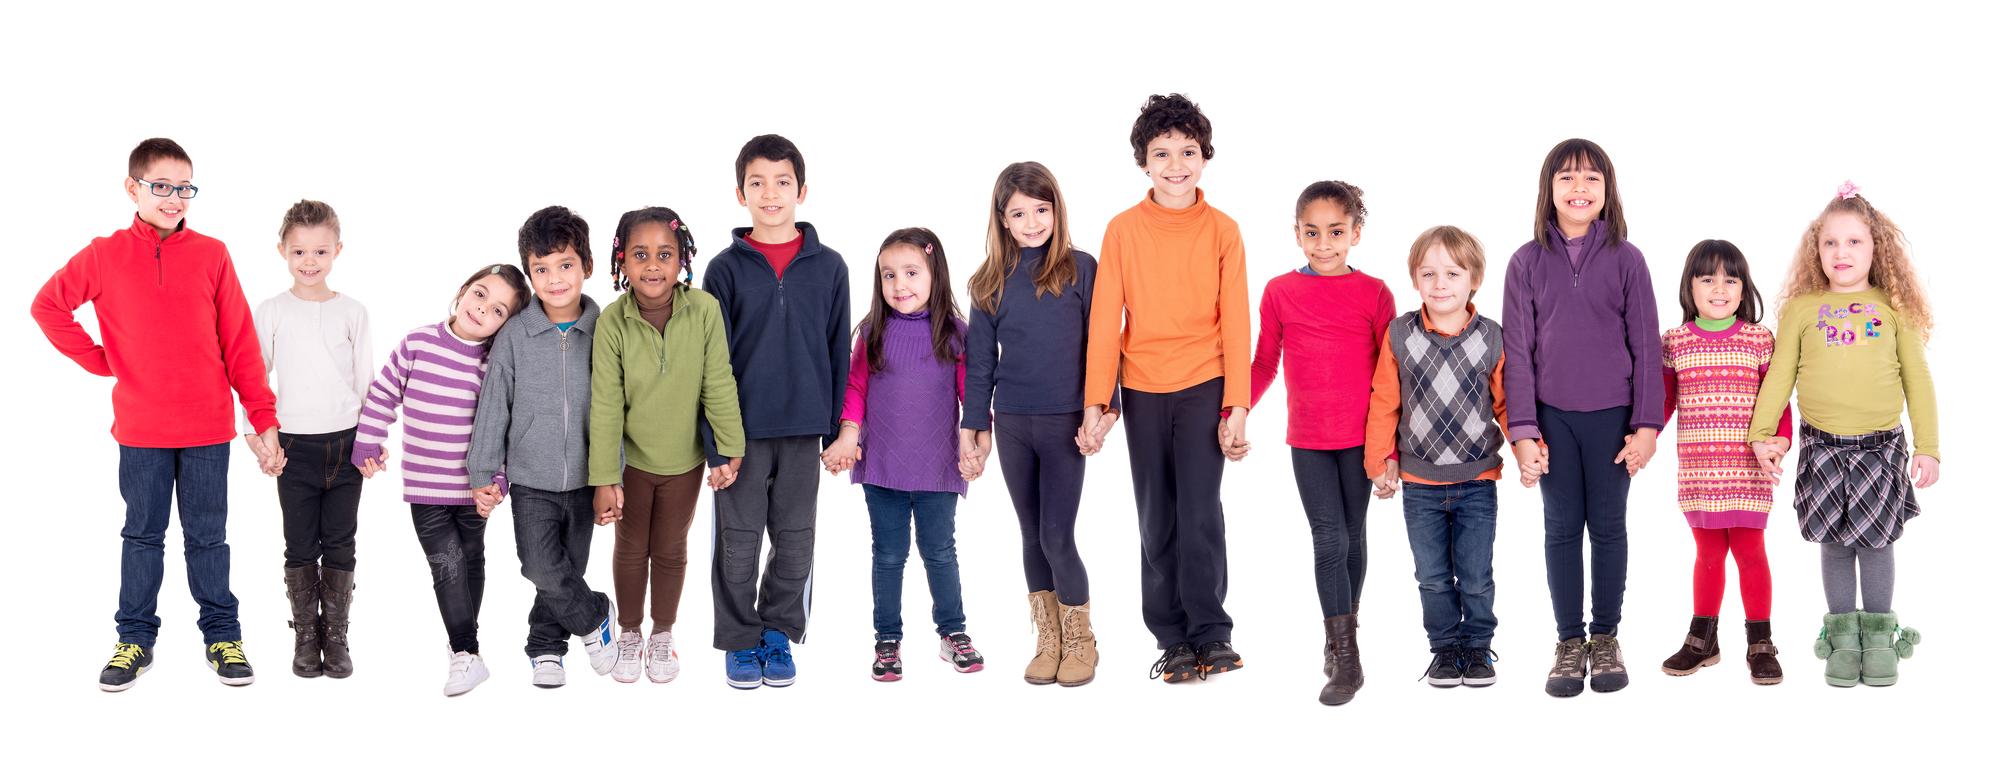 Stateline Kids Guides